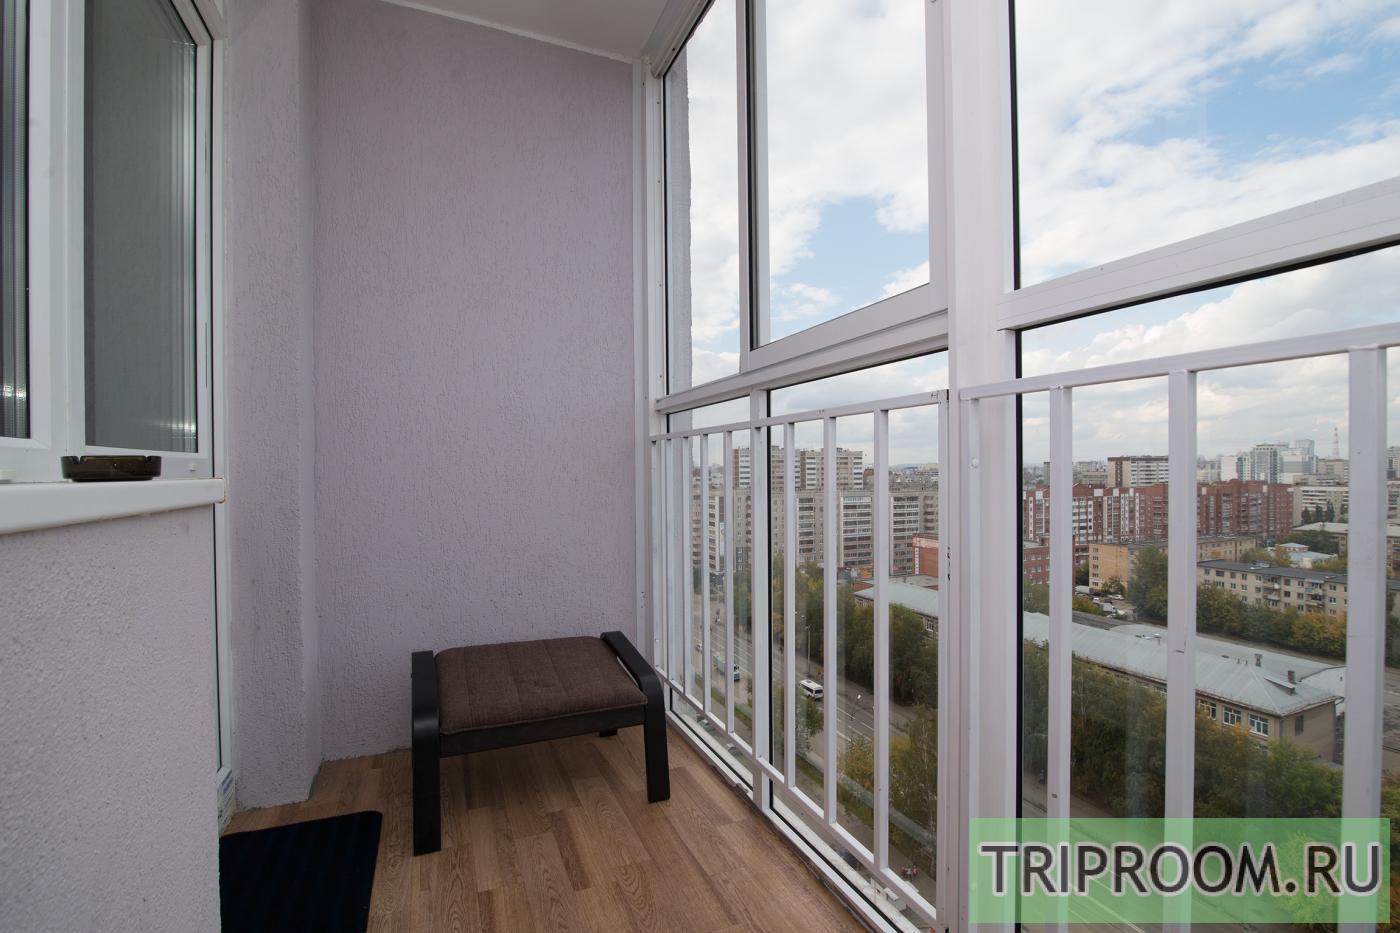 Апартаменты uyutnyy dom apartment 4 екатеринбург россия на к.